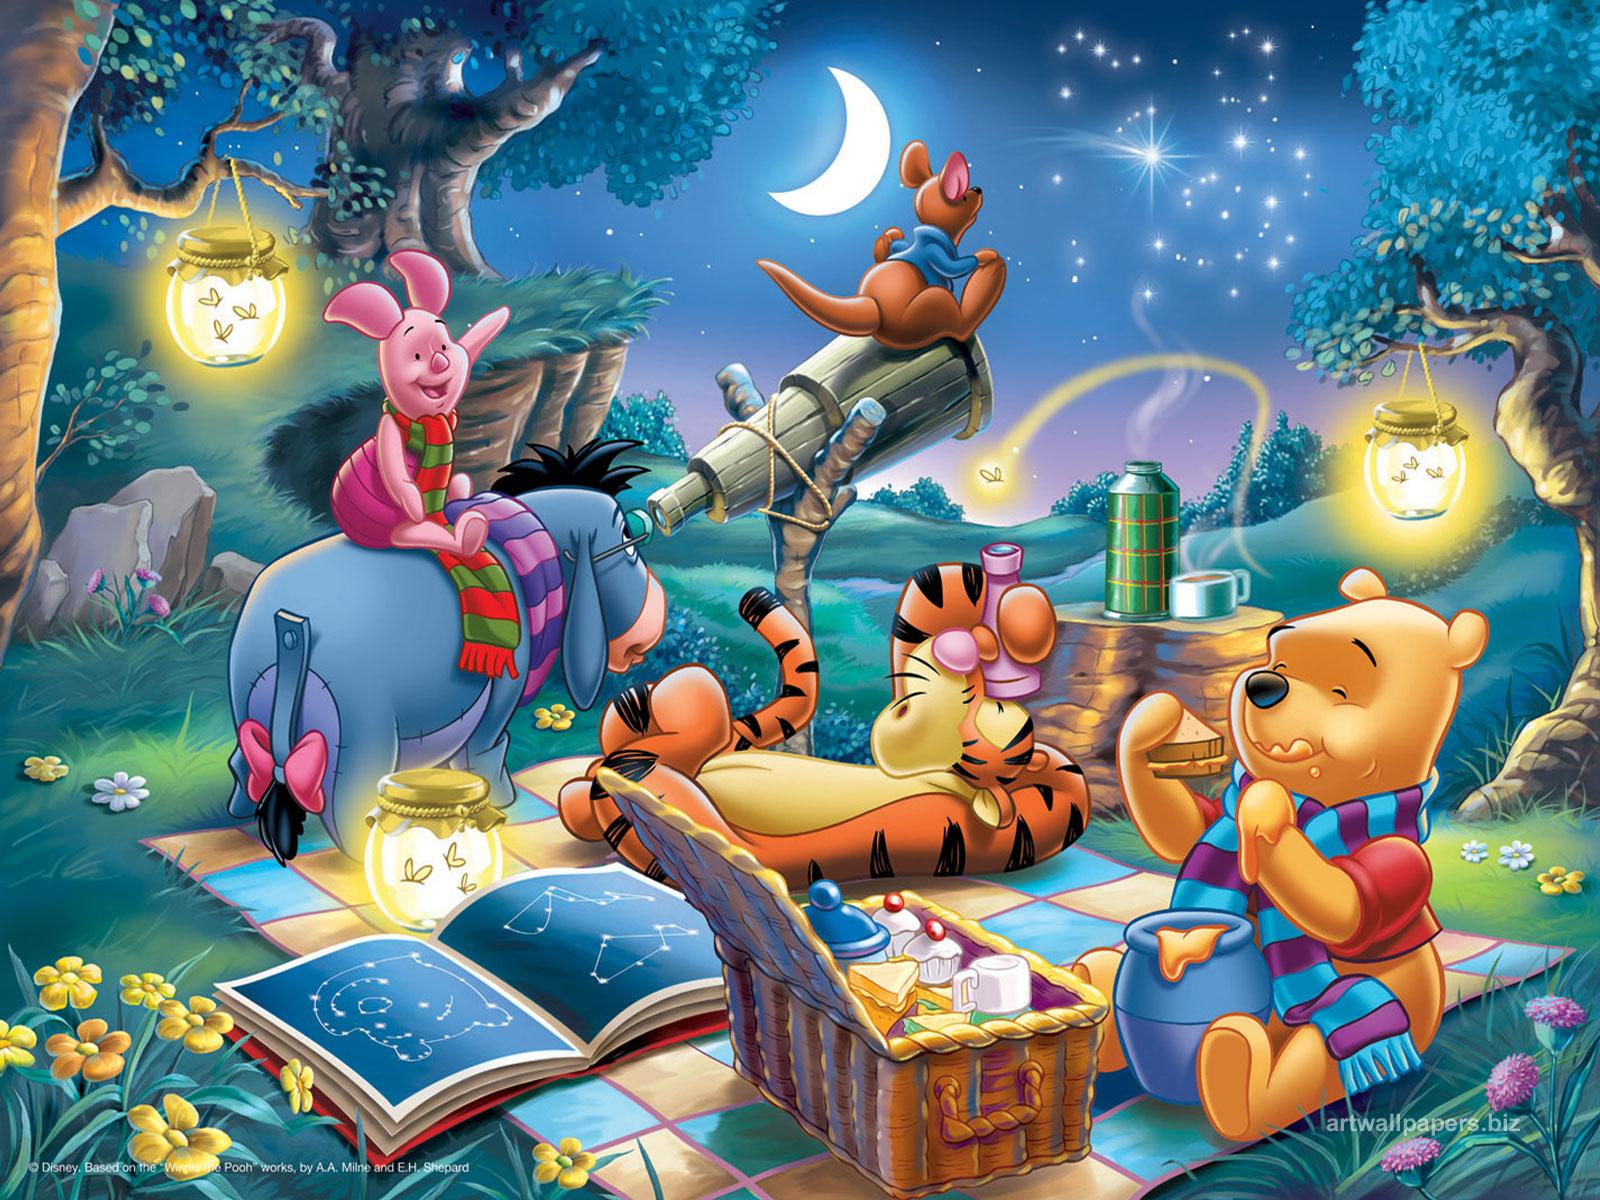 Free Download Poohjpg Winnie The Pooh Pinterest Winnie The